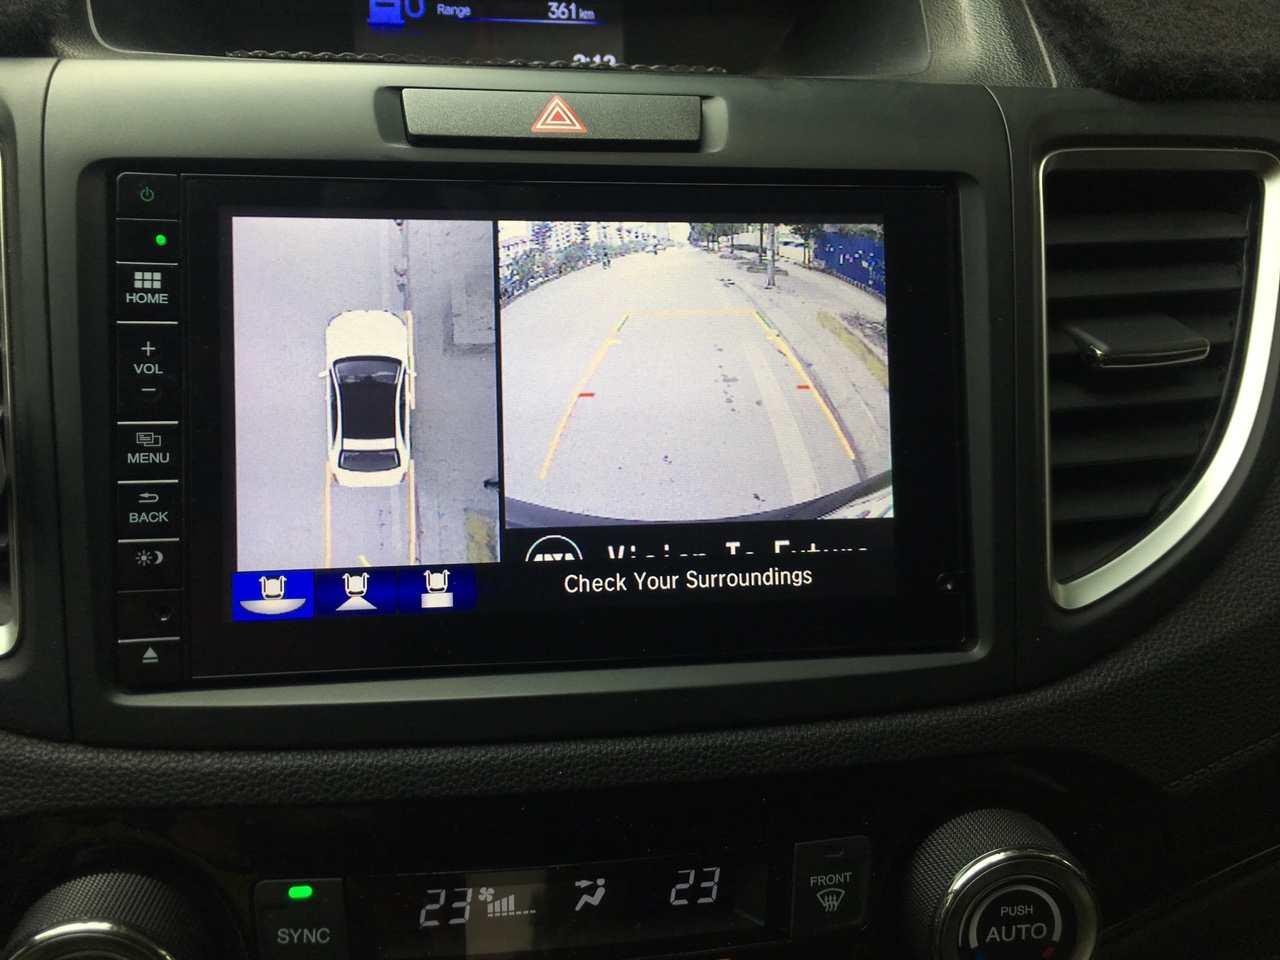 Camera 360 độ oris cho xe Honda Crv